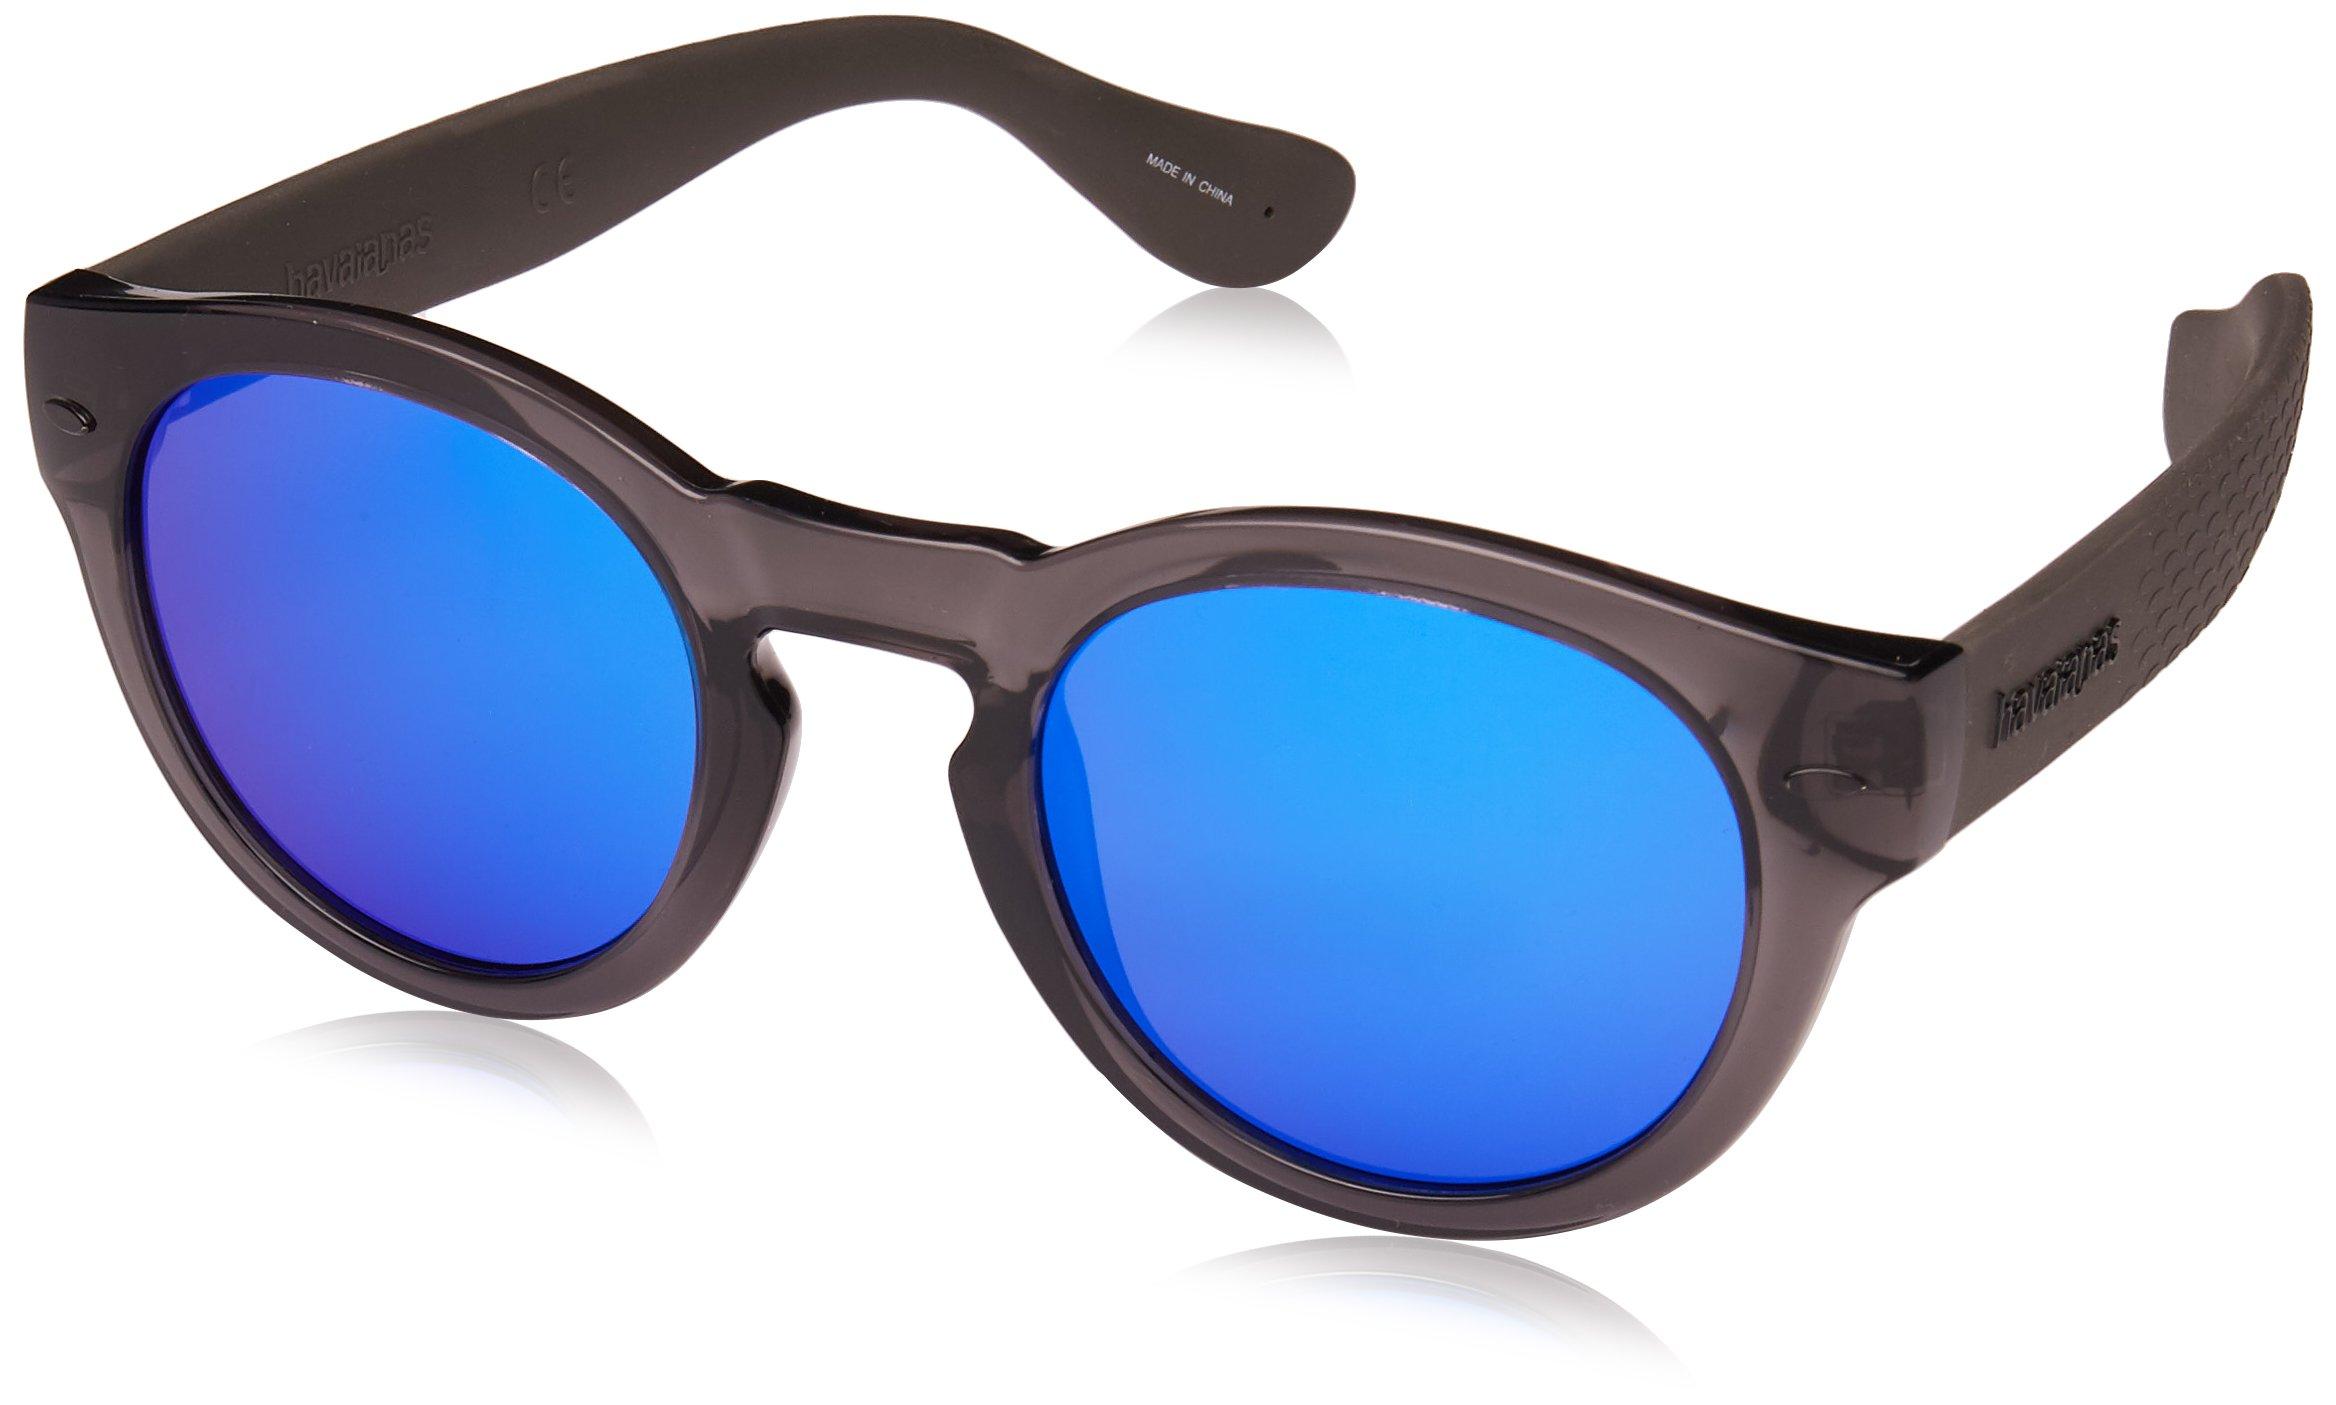 Havaianas Trancoso/m Round Sunglasses, Dark Grey, 49 mm by Havaianas